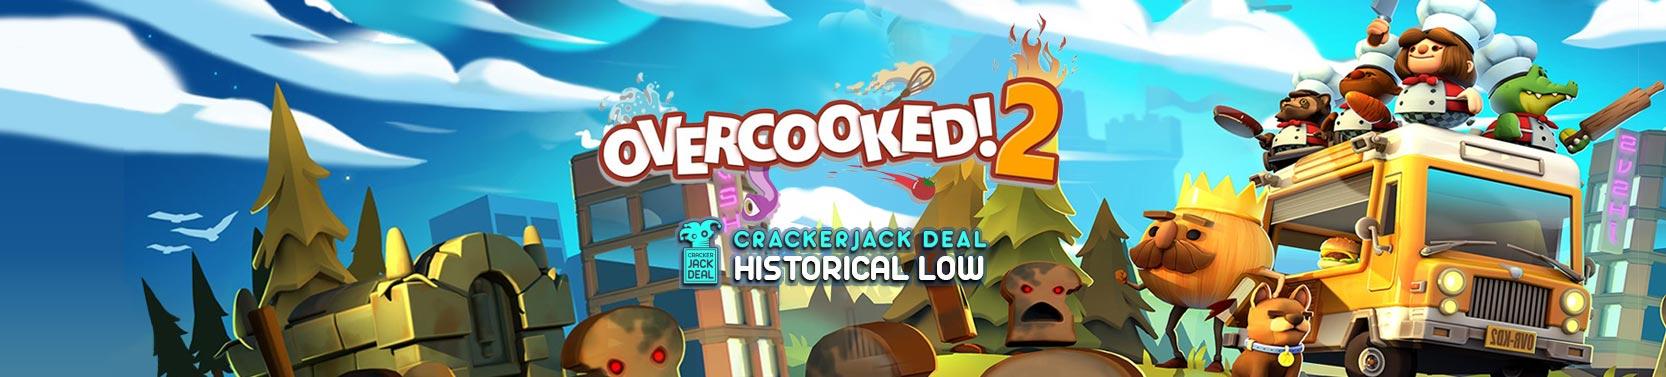 Crackerjack banner